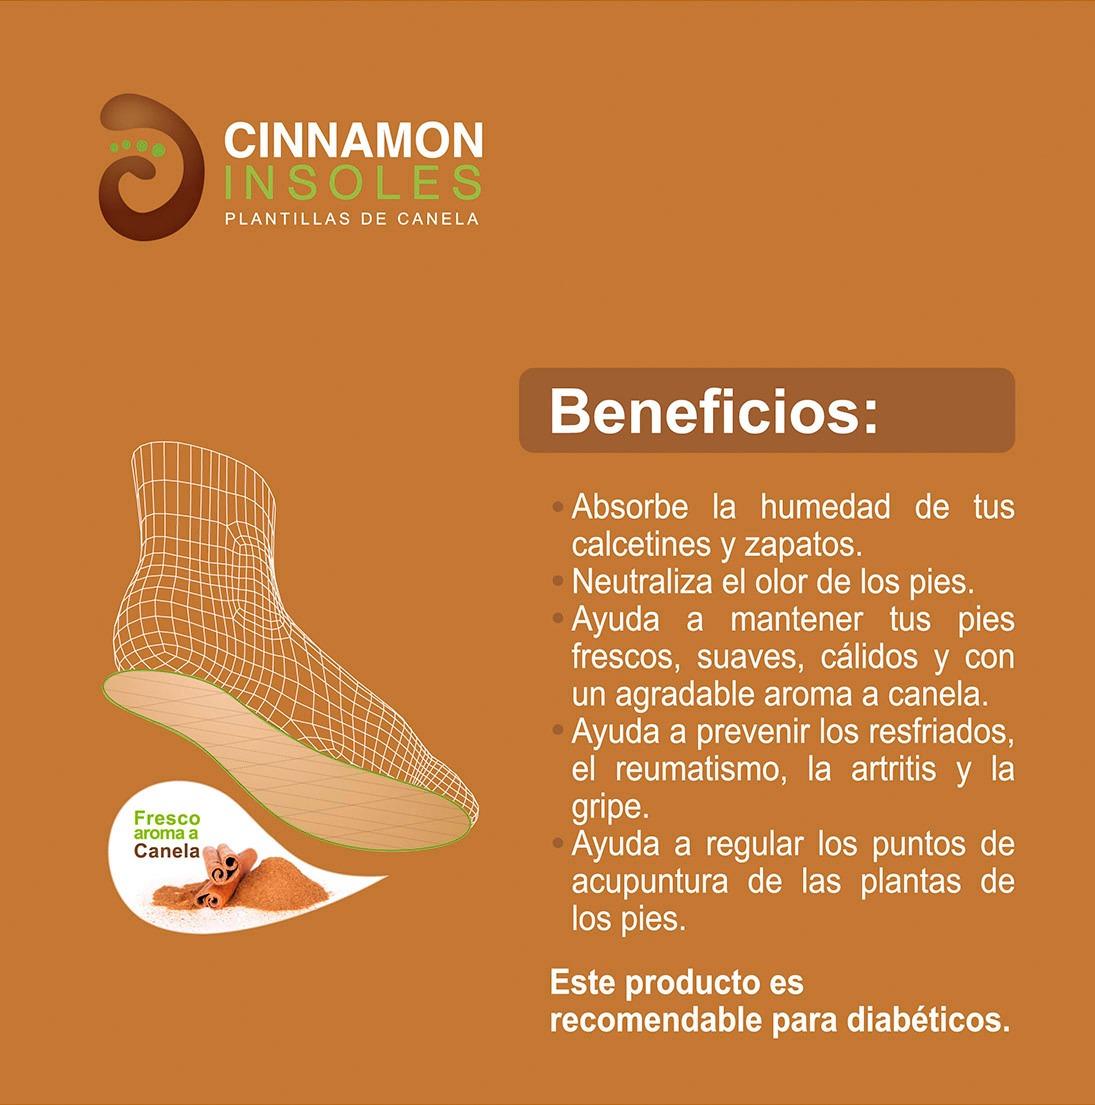 Plantillas De Canela 100% Natural - S/ 34,96 en Mercado Libre